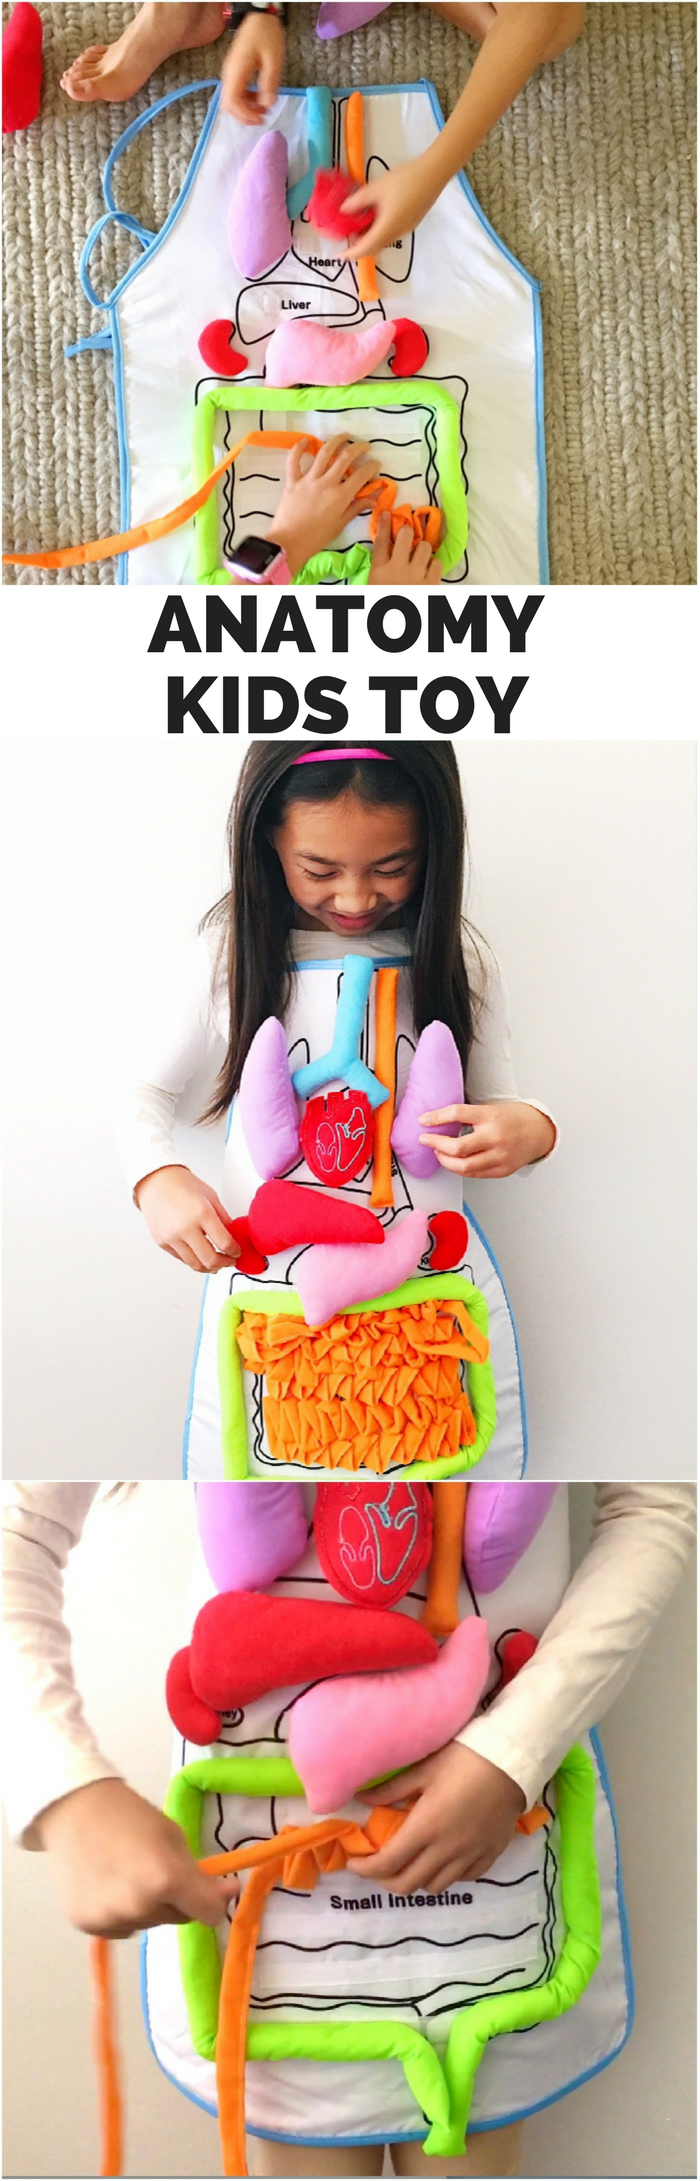 Fun Anatomy Apron Toy for Kids #anatomy #learningtoy #kidstoys ...